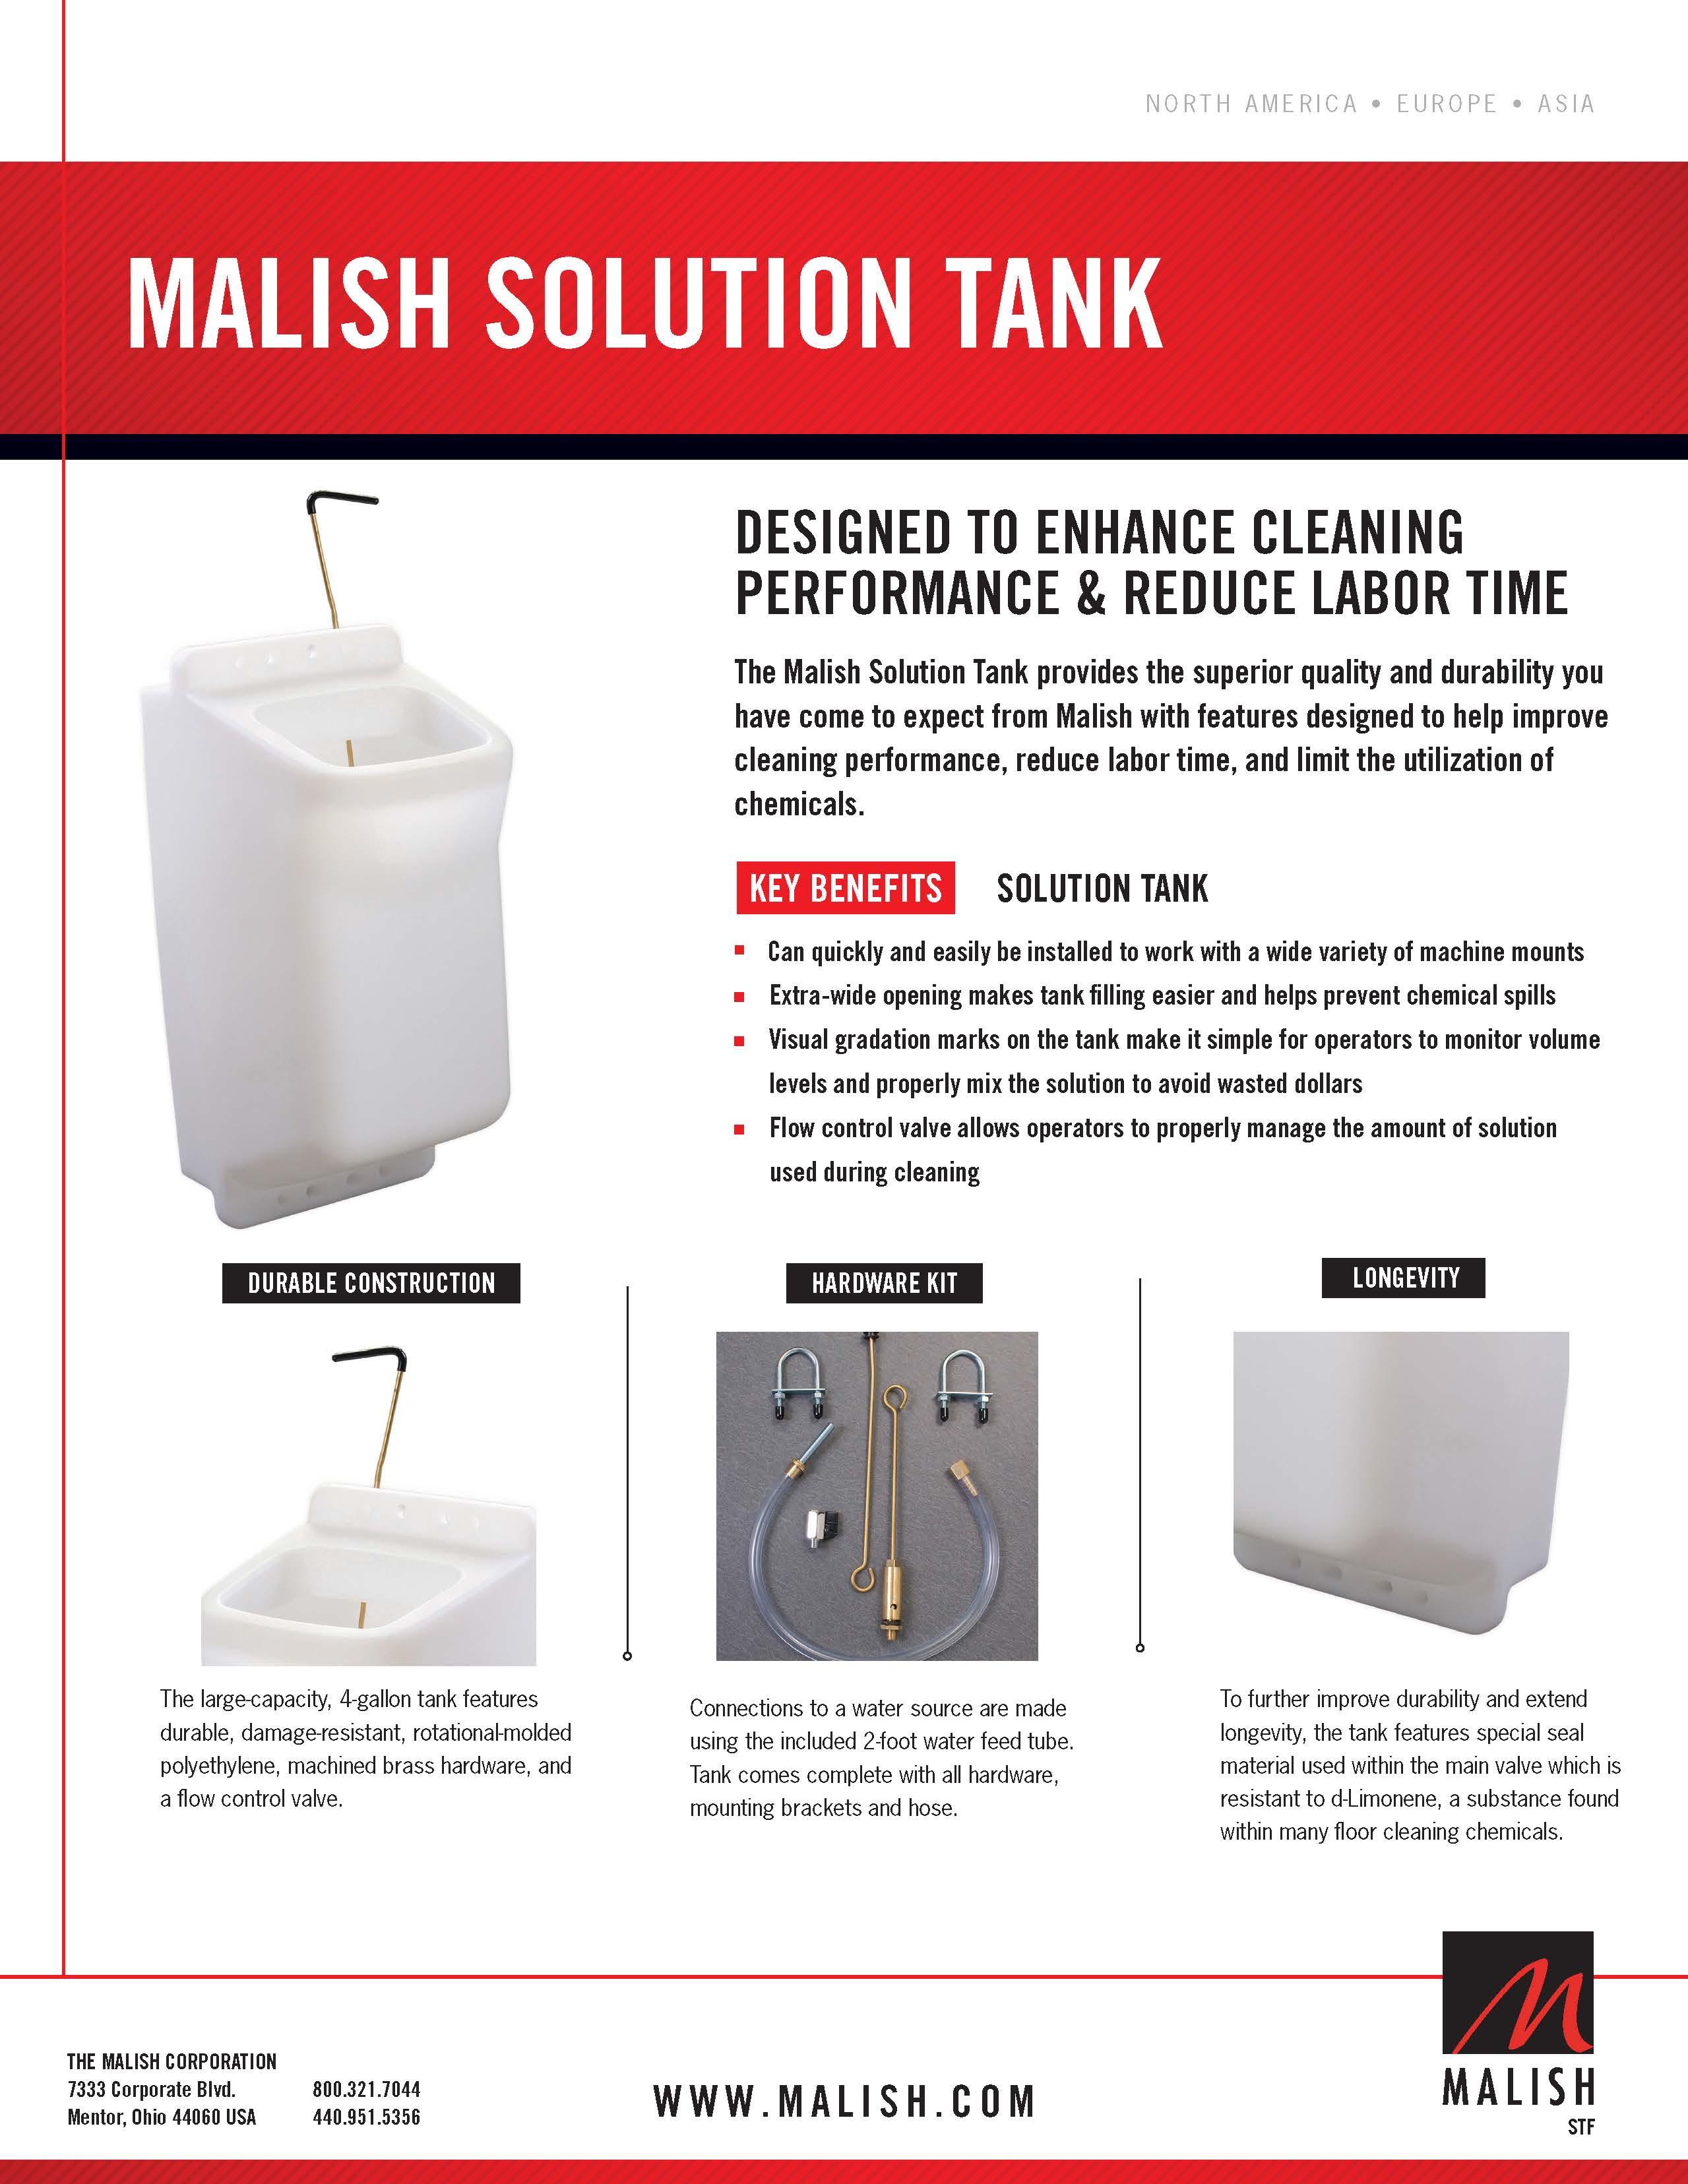 The Malish Shampoo Tank